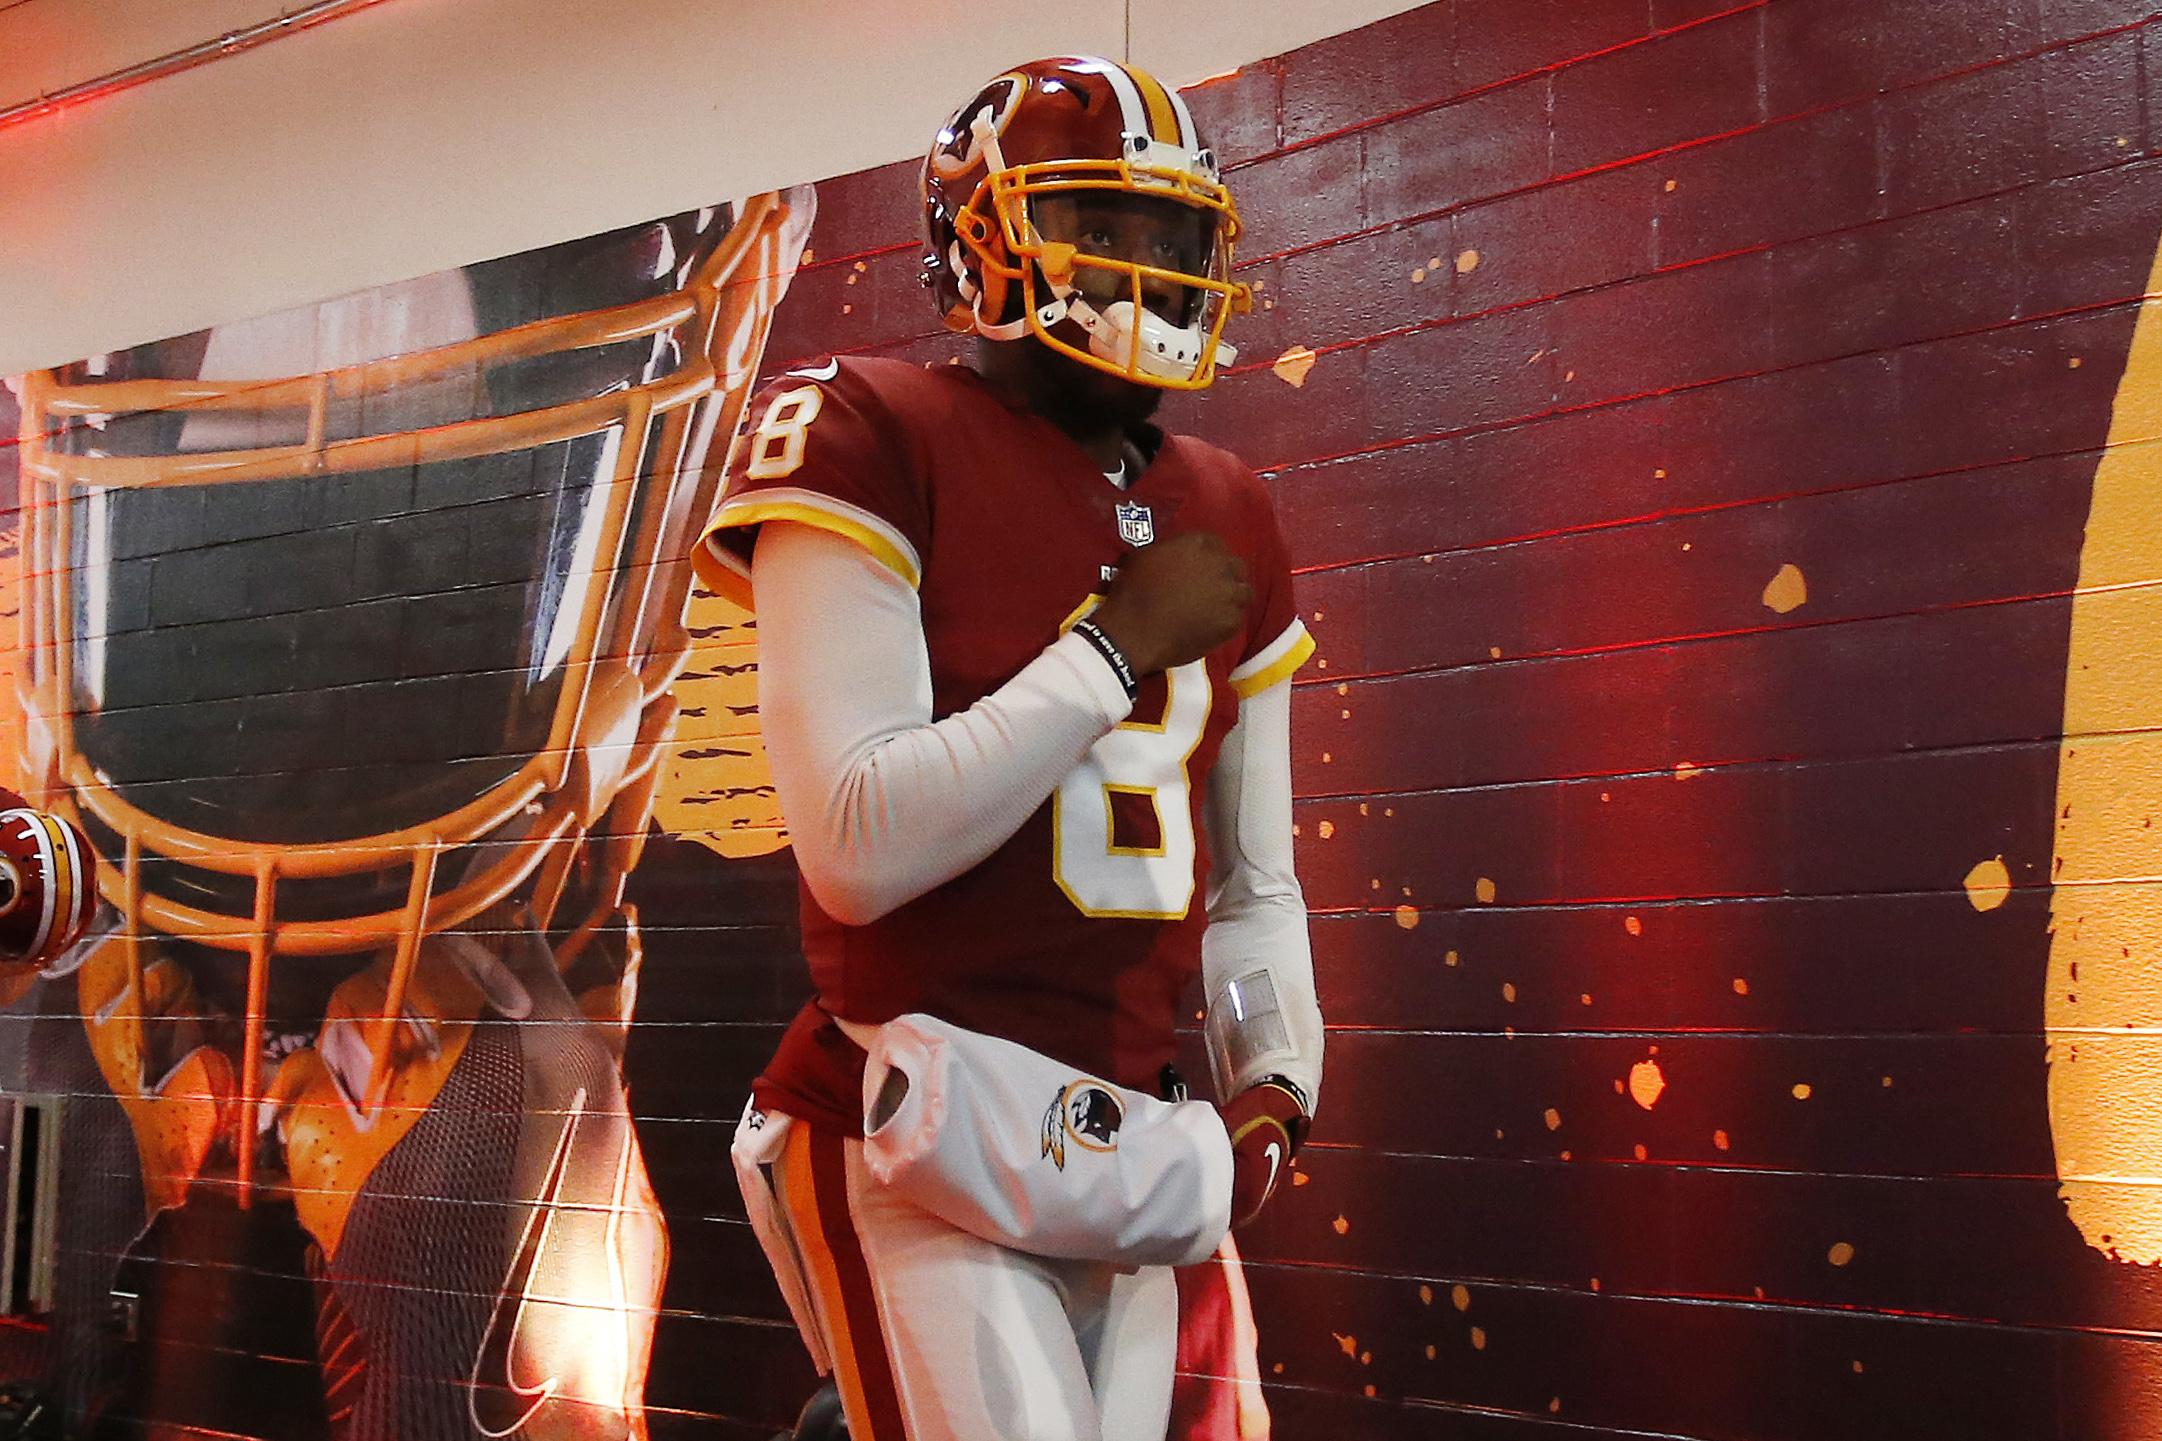 65e4dae8f Ranking All 32 NFL Starting Quarterbacks From Worst To Best. 32. Josh  Johnson – Washington Redskins